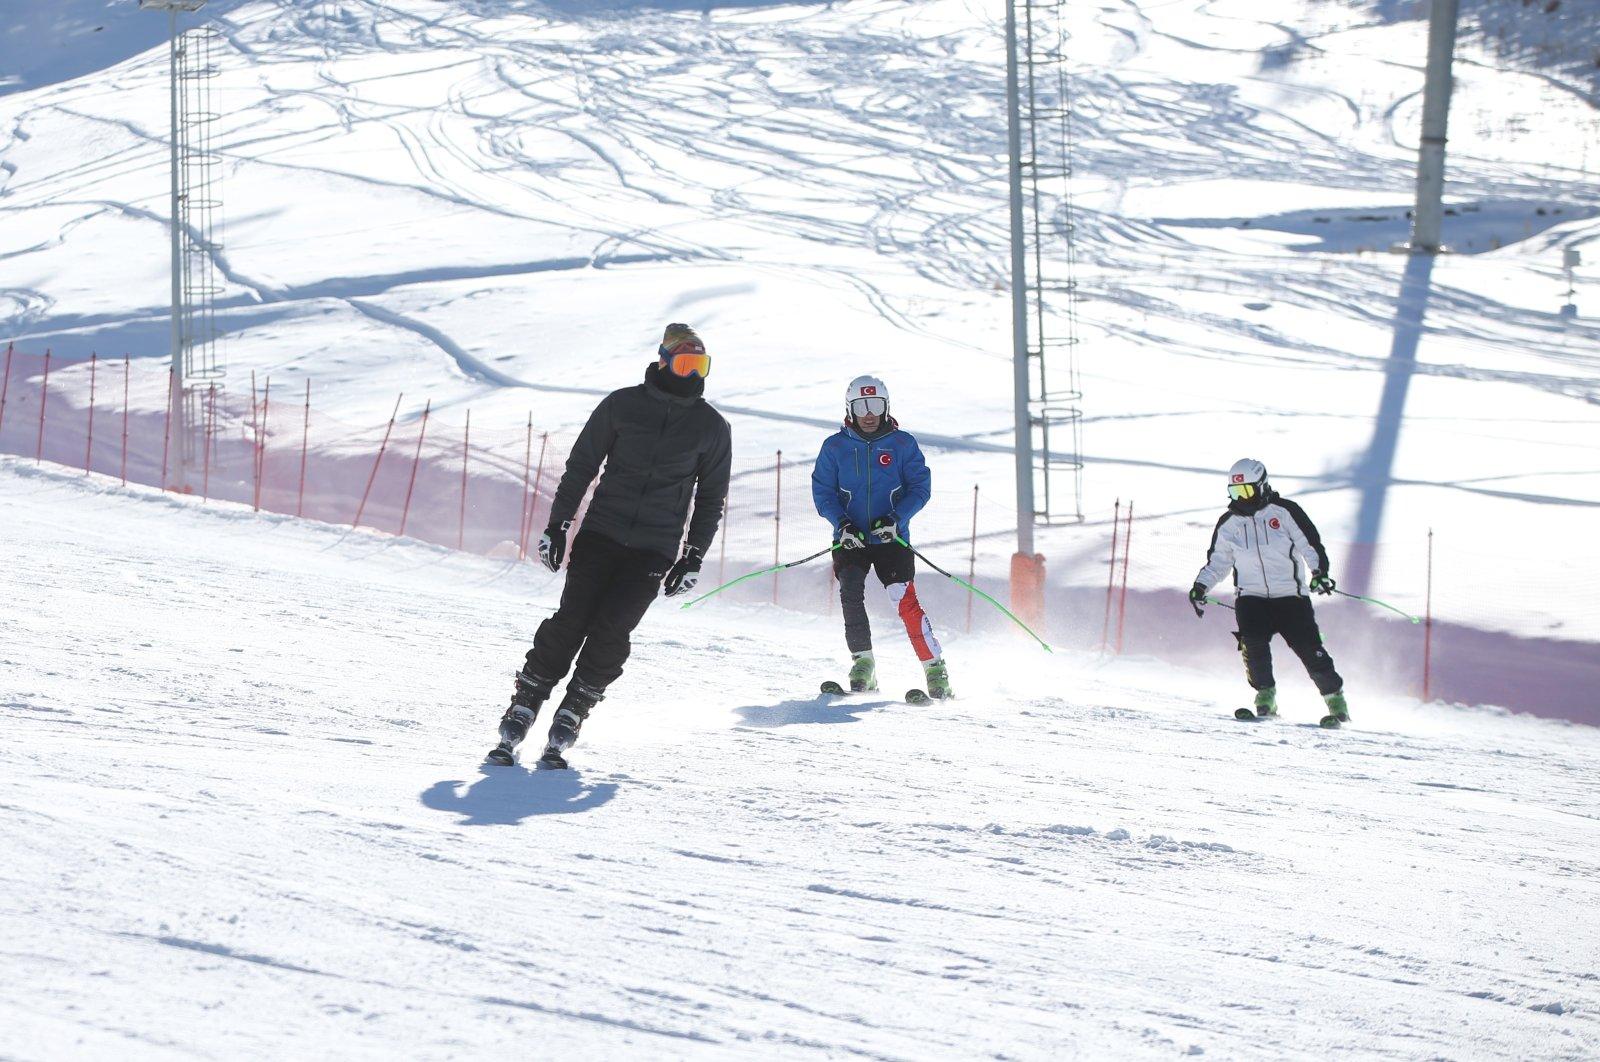 People ski before the start of a partial COVID-19 curfew on New Year's Eve, Palandöken, Erzurum, eastern Turkey, Dec. 31, 2020. (AA Photo)